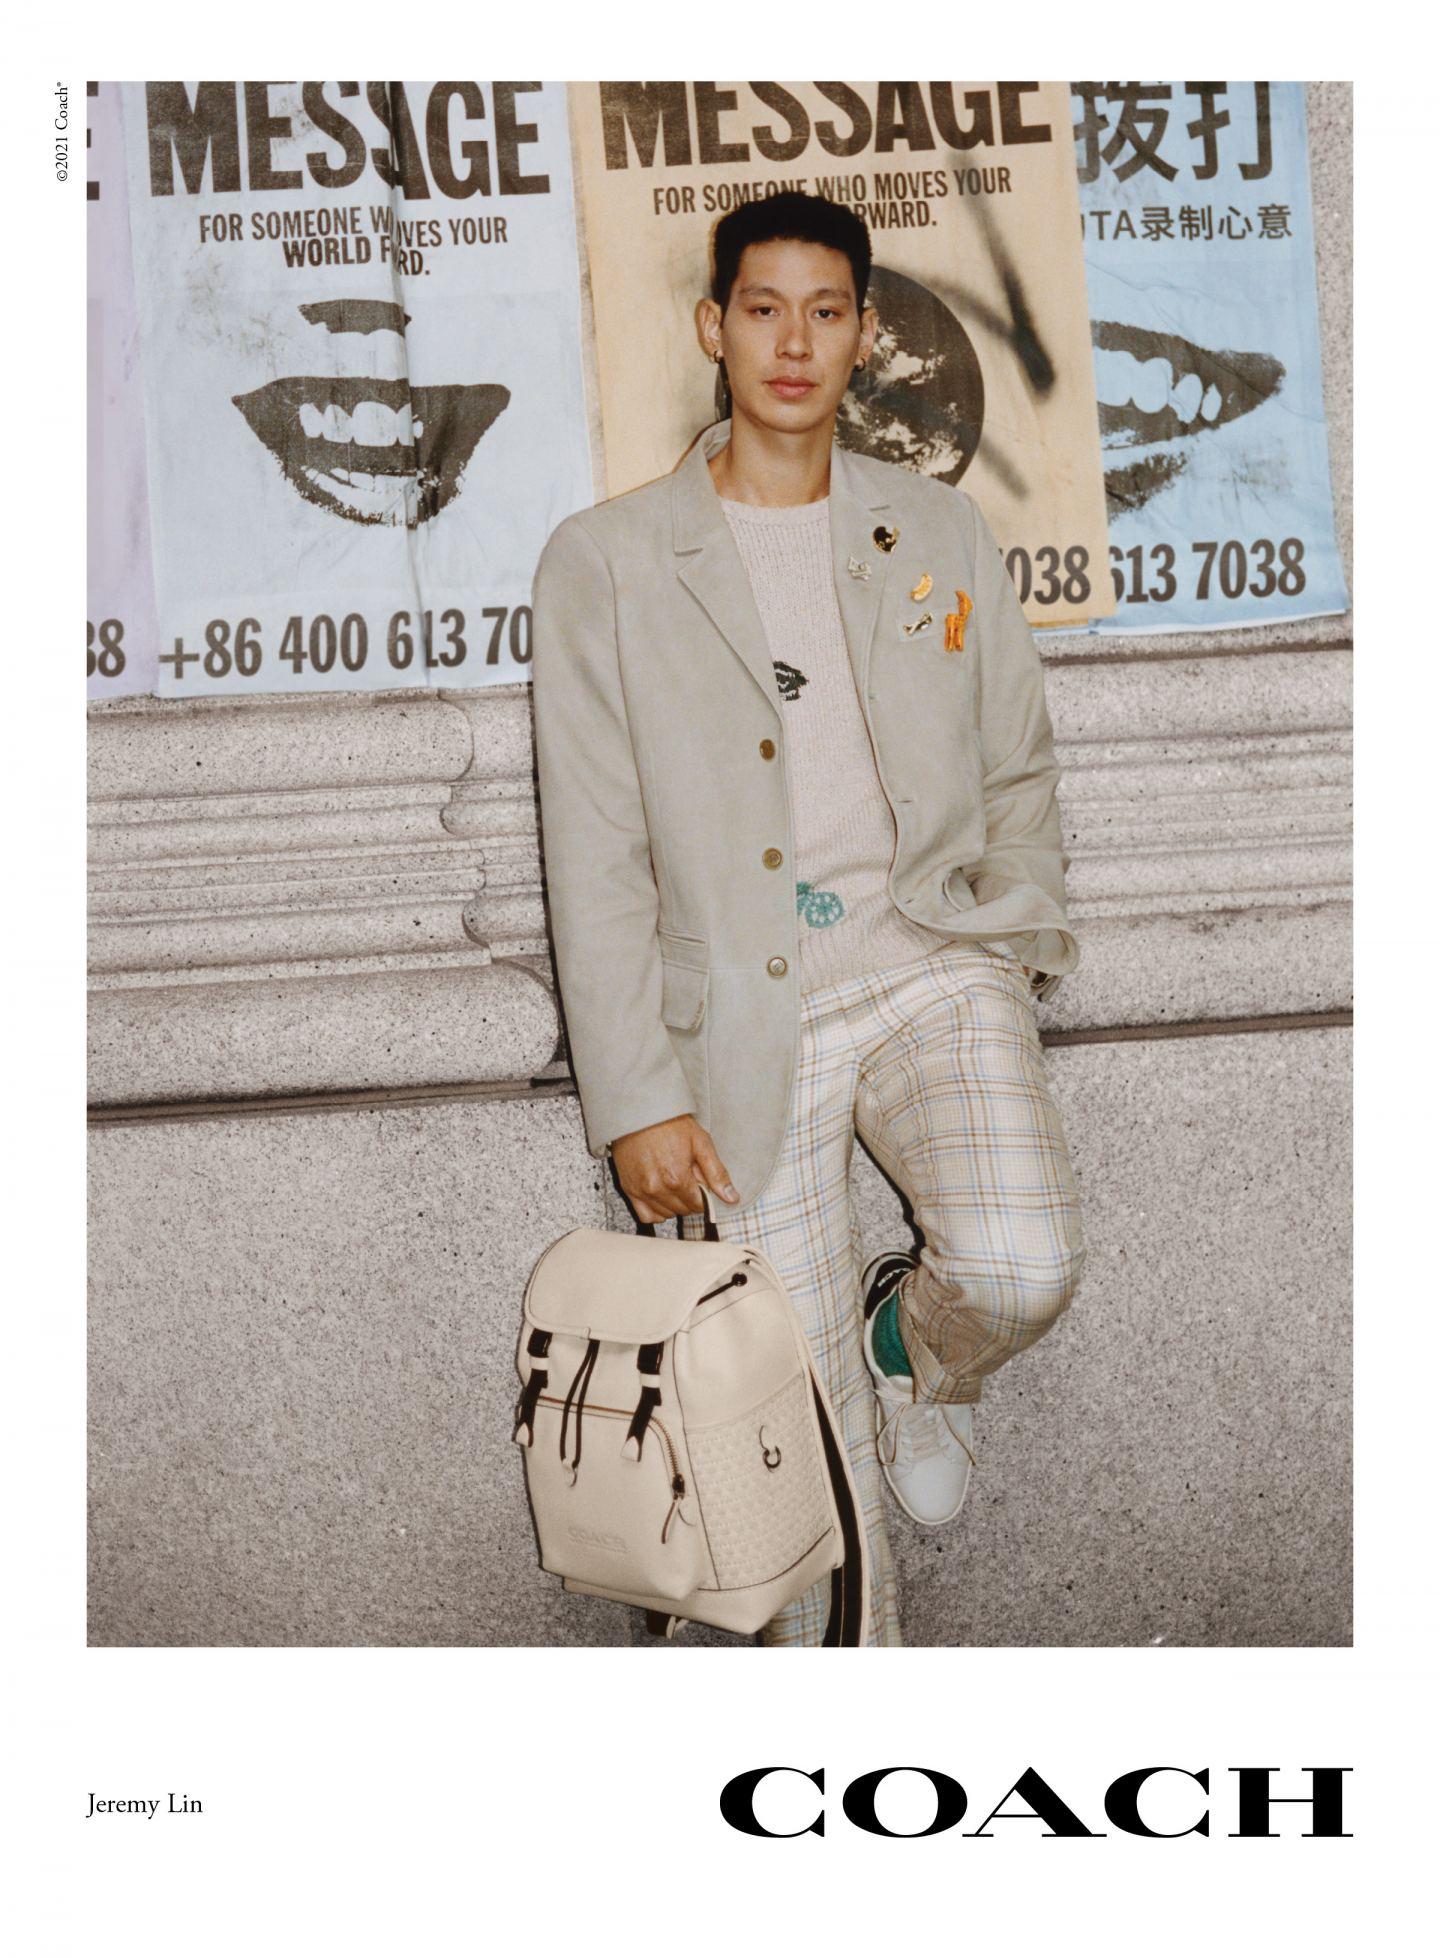 coach jeremy lin coach bags handbags